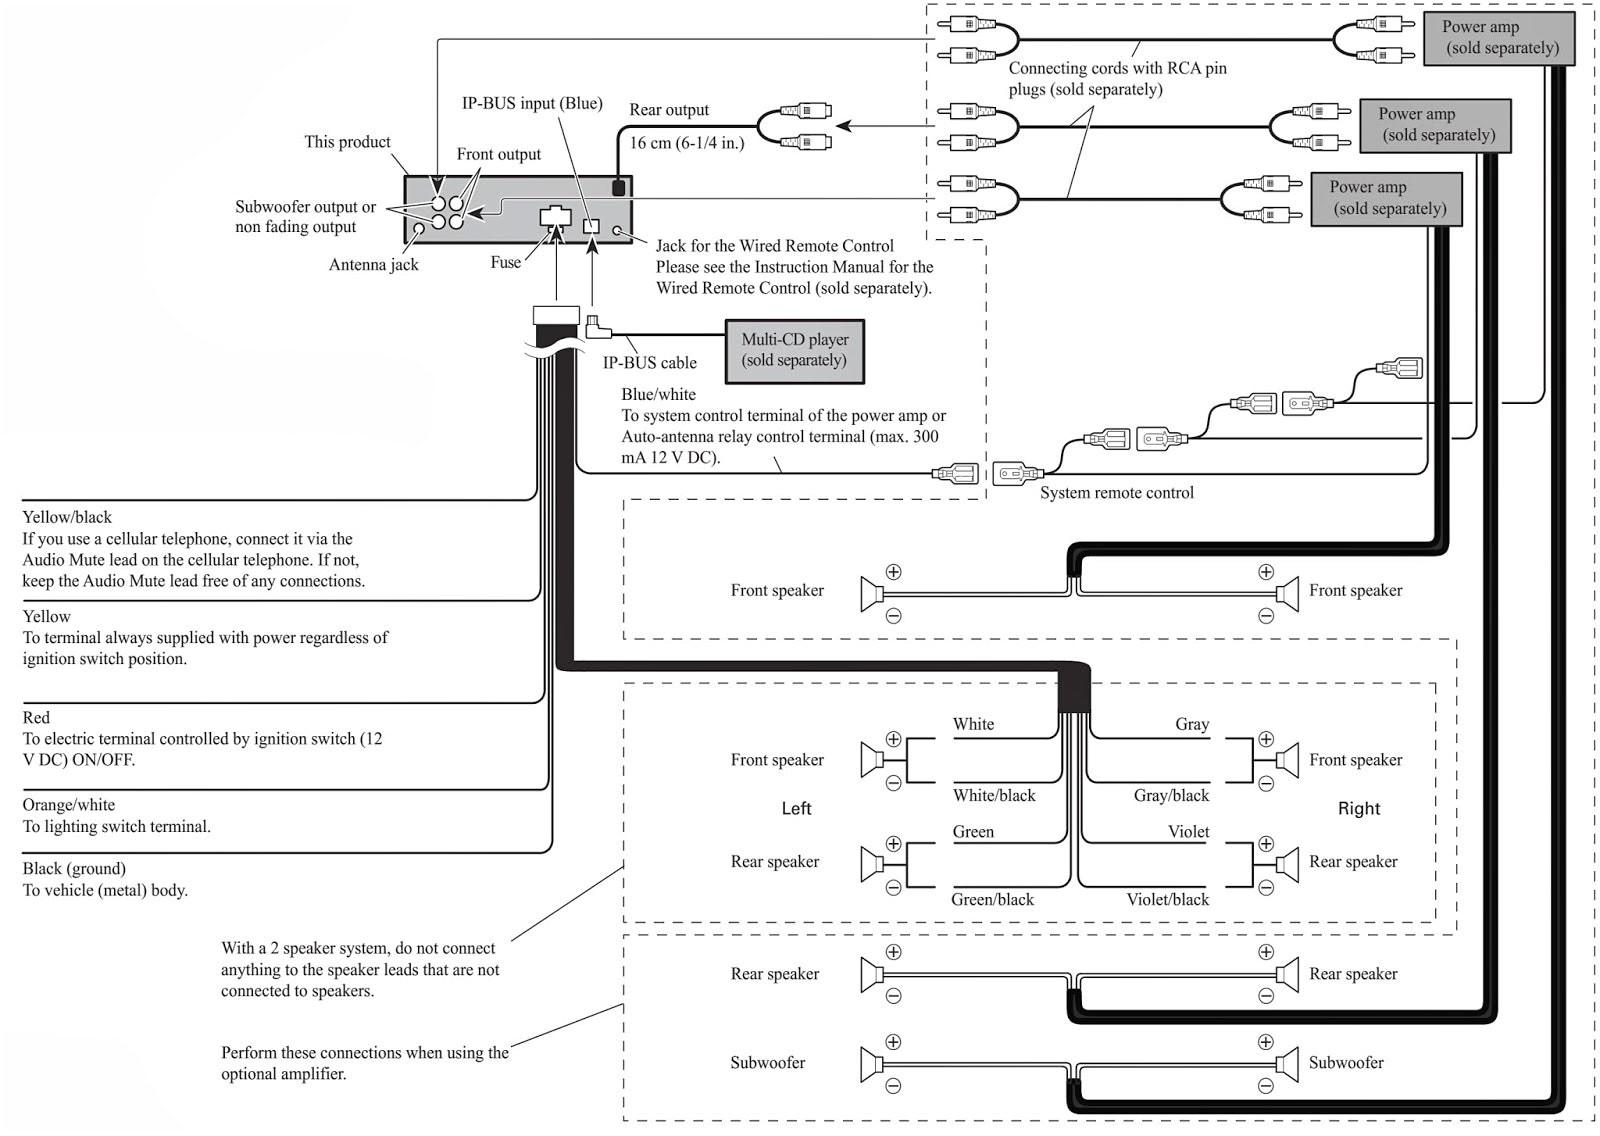 pioneer deh 150mp wiring diagram elegant wiring diagram image rh mainetreasurechest com wiring diagram pioneer deh-150mp pioneer deh3300ub wiring diagram